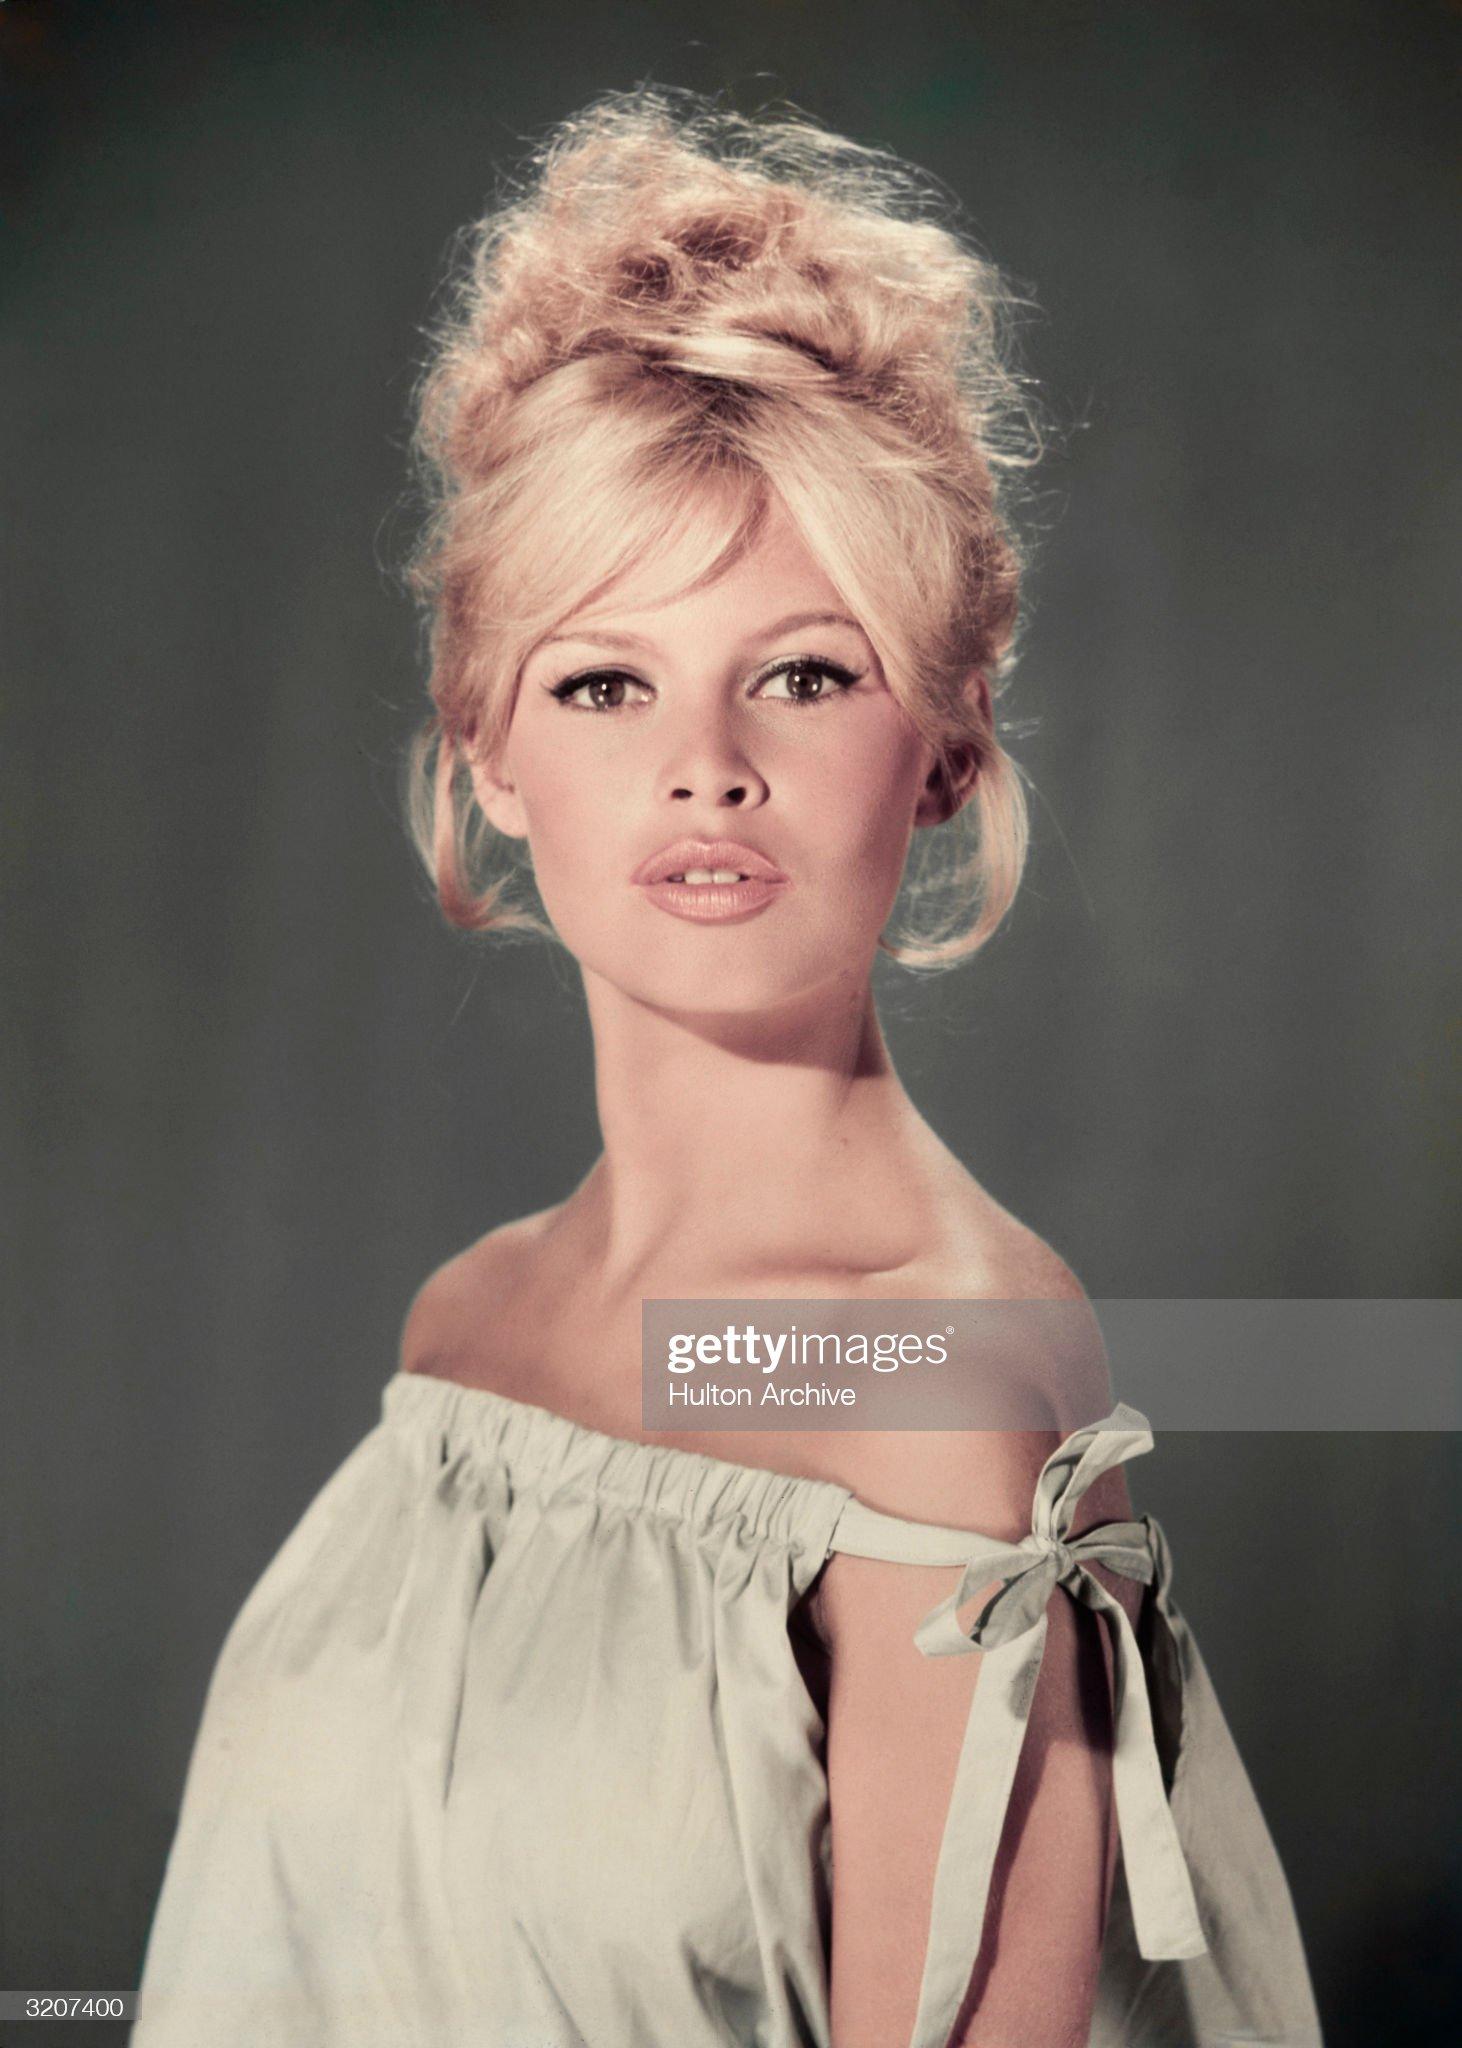 Pouting Bardot : News Photo